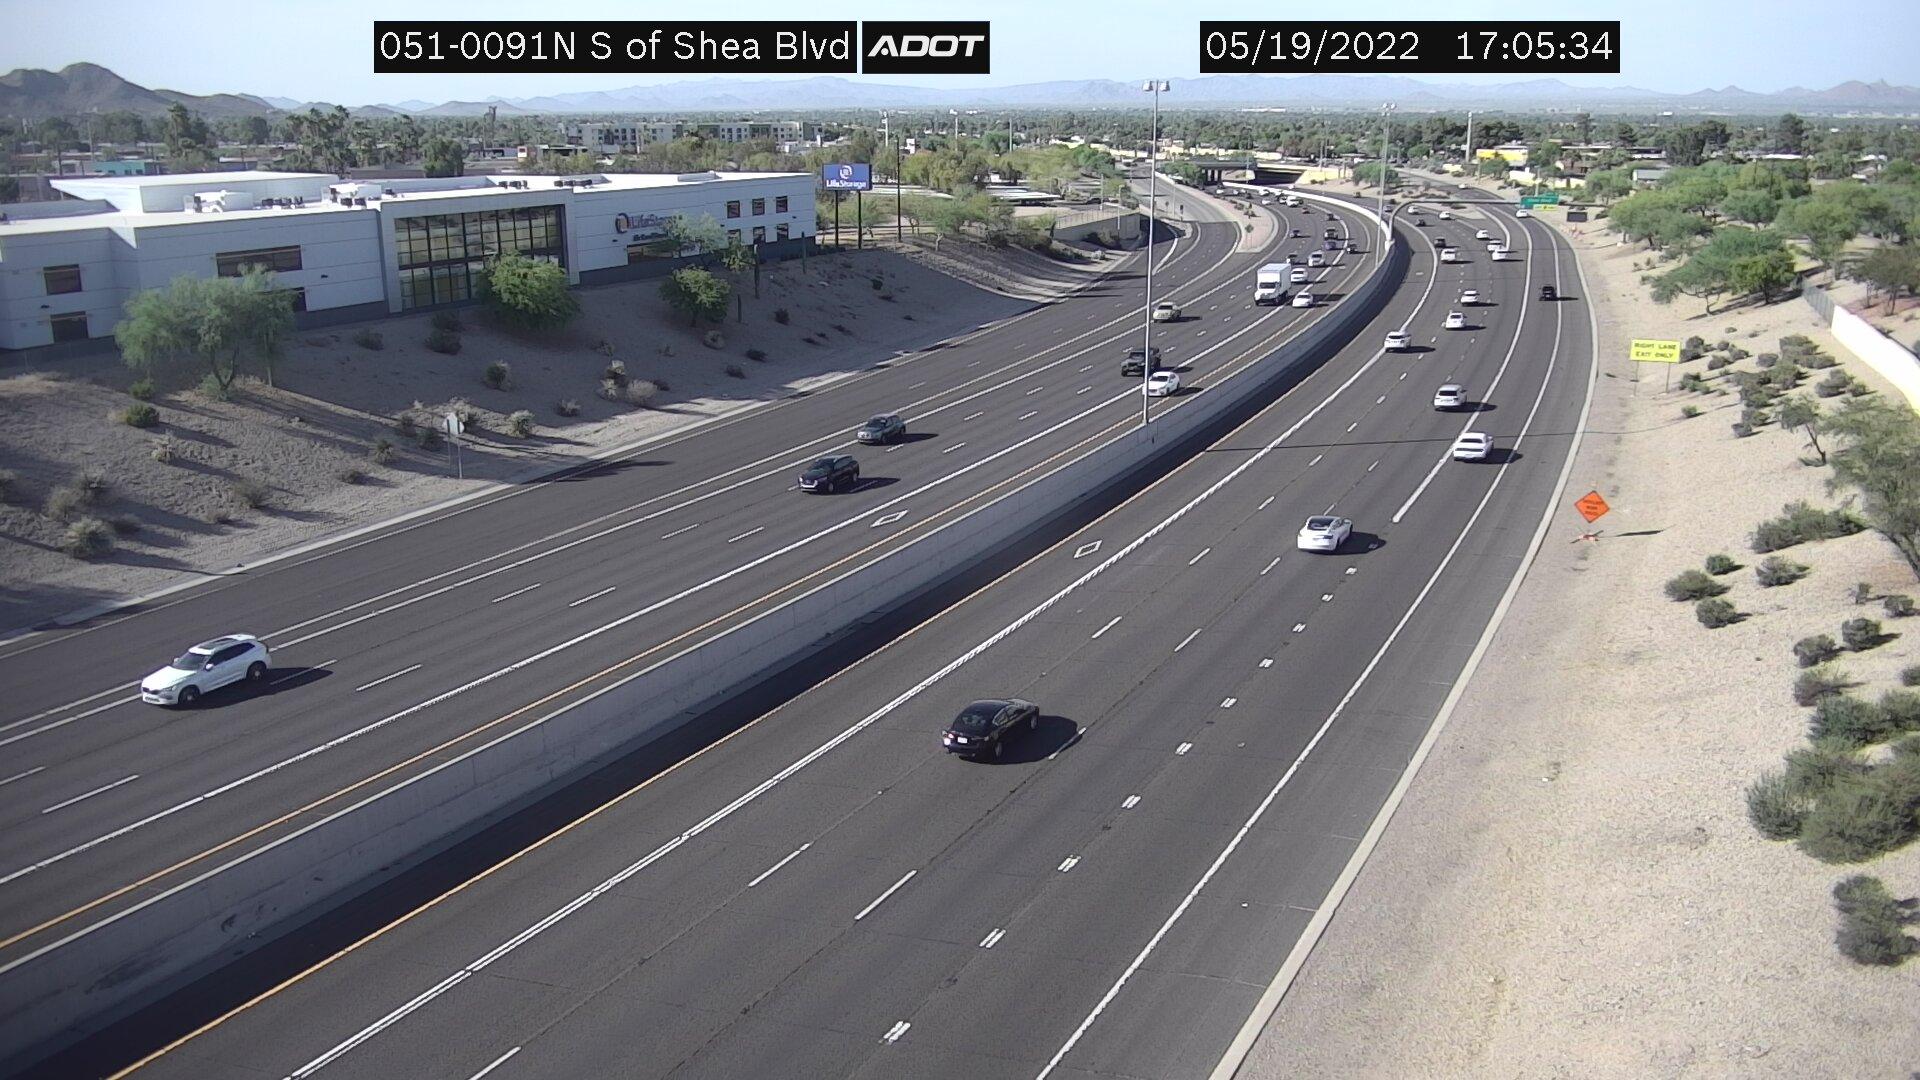 S of Shea NB (SR51) (085) - Phoenix and Arizona